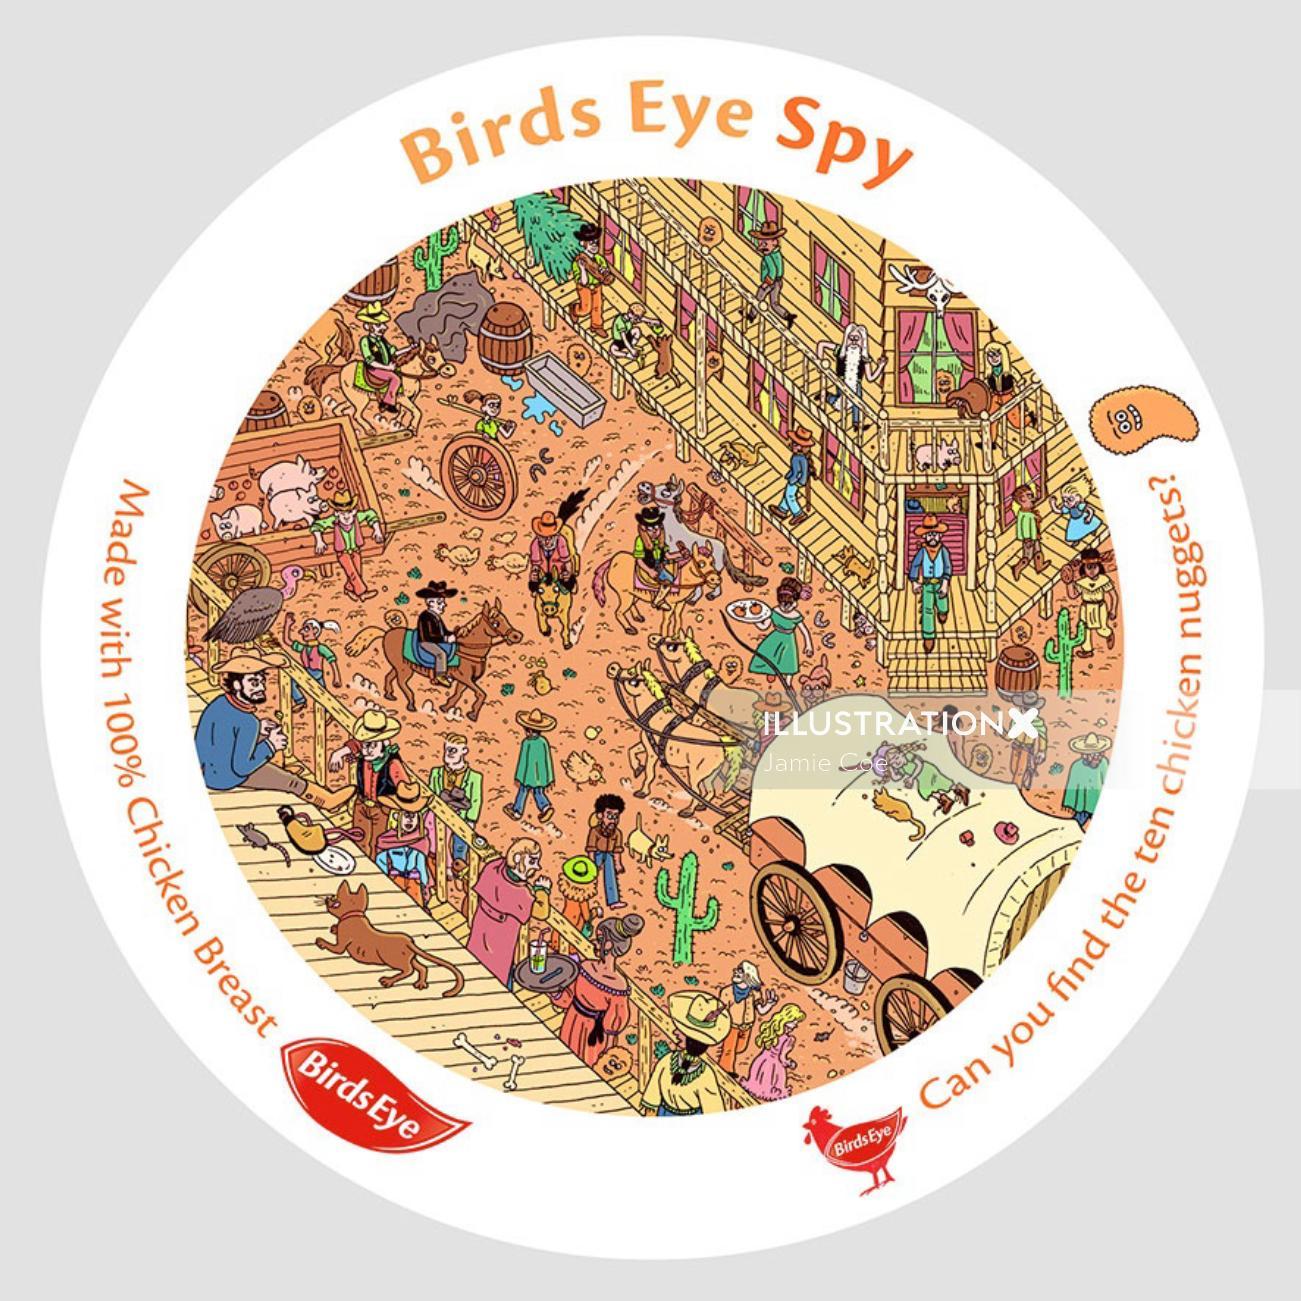 Graphic Birds Eye Spy